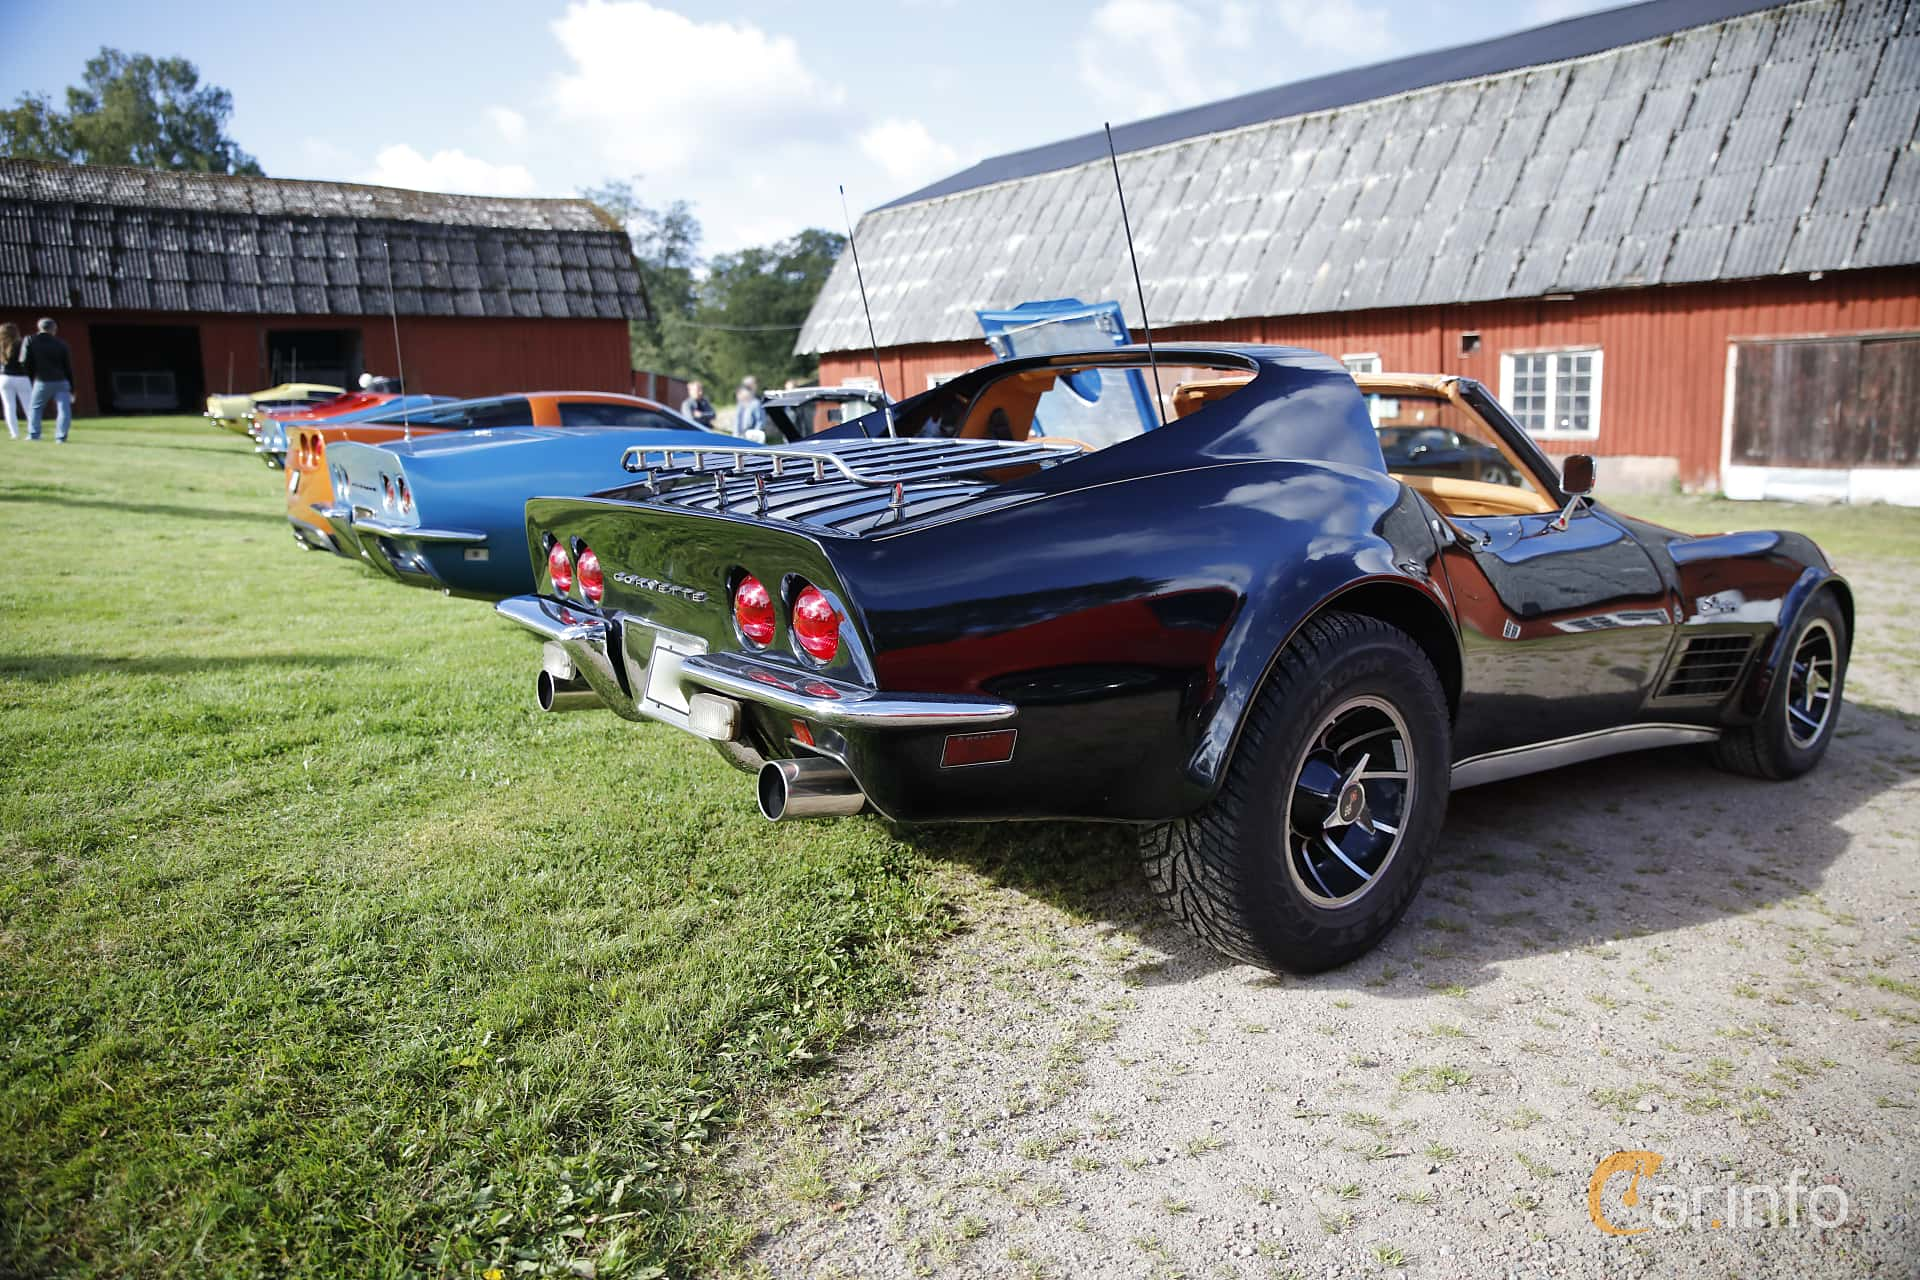 Chevrolet Corvette Stingray 5.7 V8 Automatic, 273hp, 1971 at Sportvagnsträffen 2016